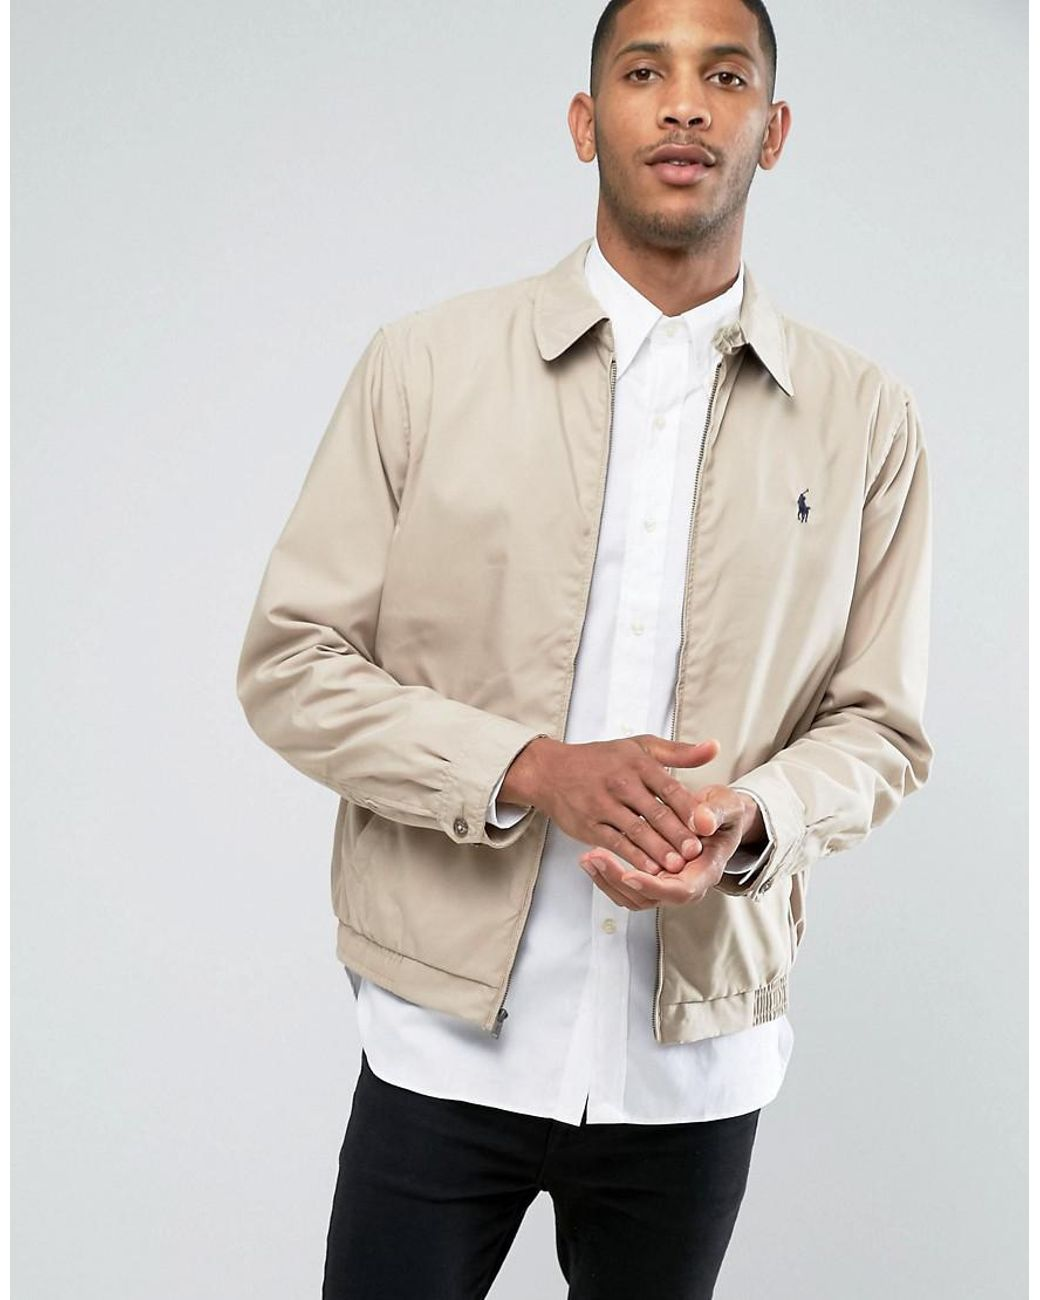 6469b41a8178 Polo Ralph Lauren Harrington Jacket in Natural for Men - Lyst